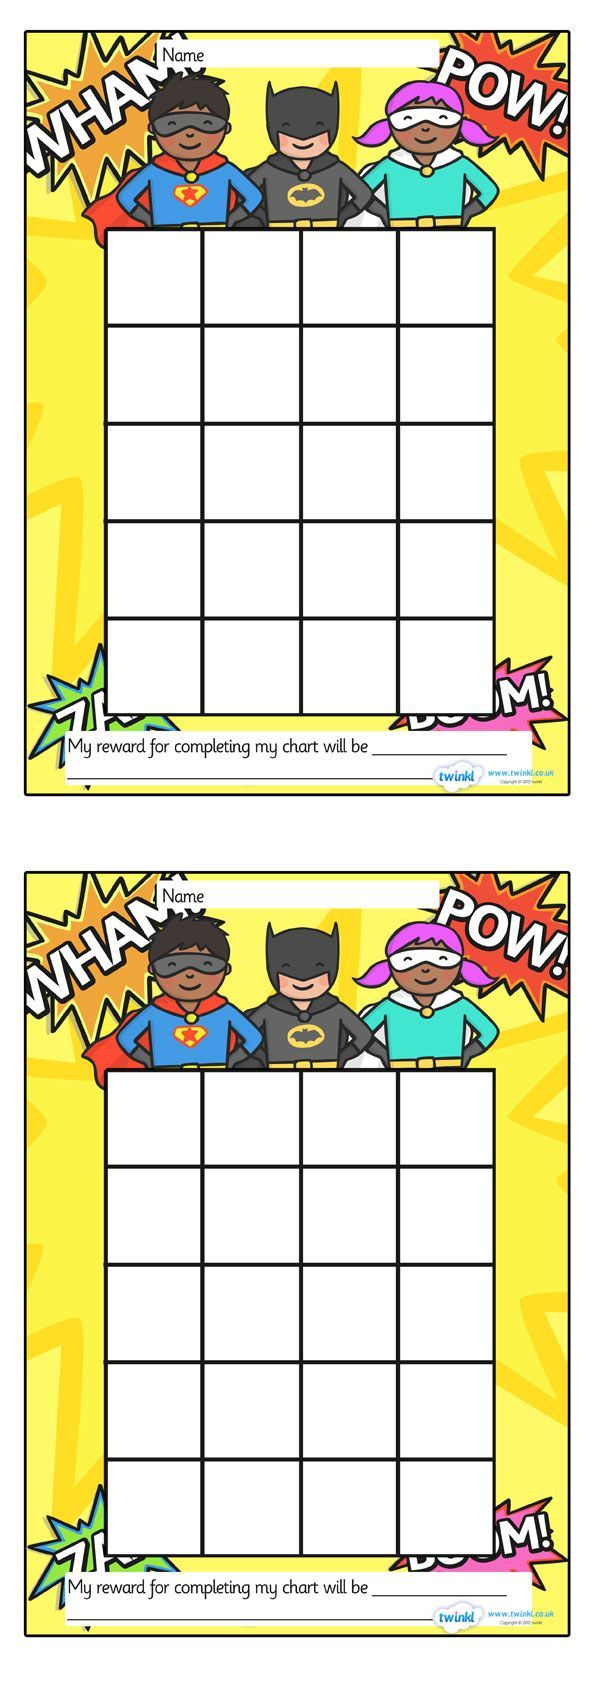 Twinkl Resources >> Superhero Sticker/Stamp Reward Chart >> Classroom printables for Pre-School, Kindergarten, Elementary School and beyond! Rewards, Sticker Charts, Class Management, Behavior: